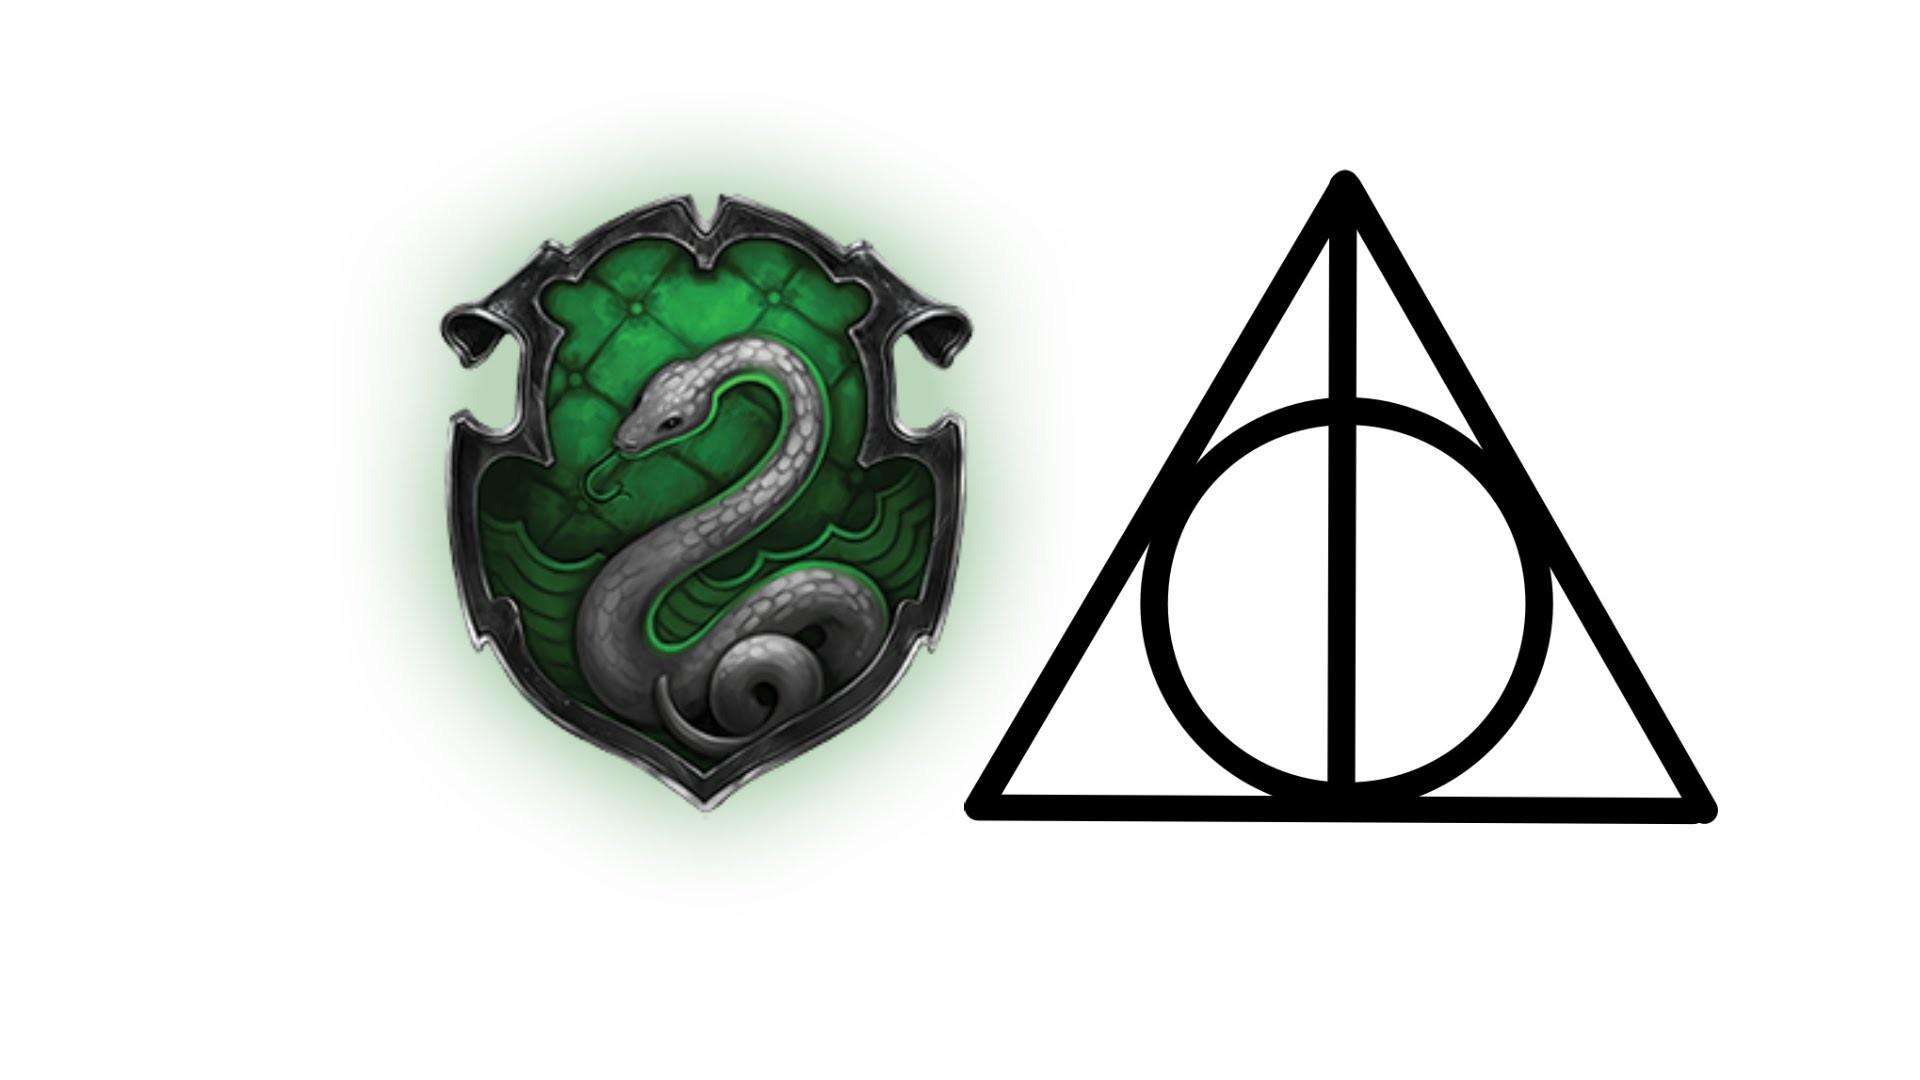 Minecraft Pixel Art Tutorial | Slytherin Deathly Hallows Logo (Harry Potter)